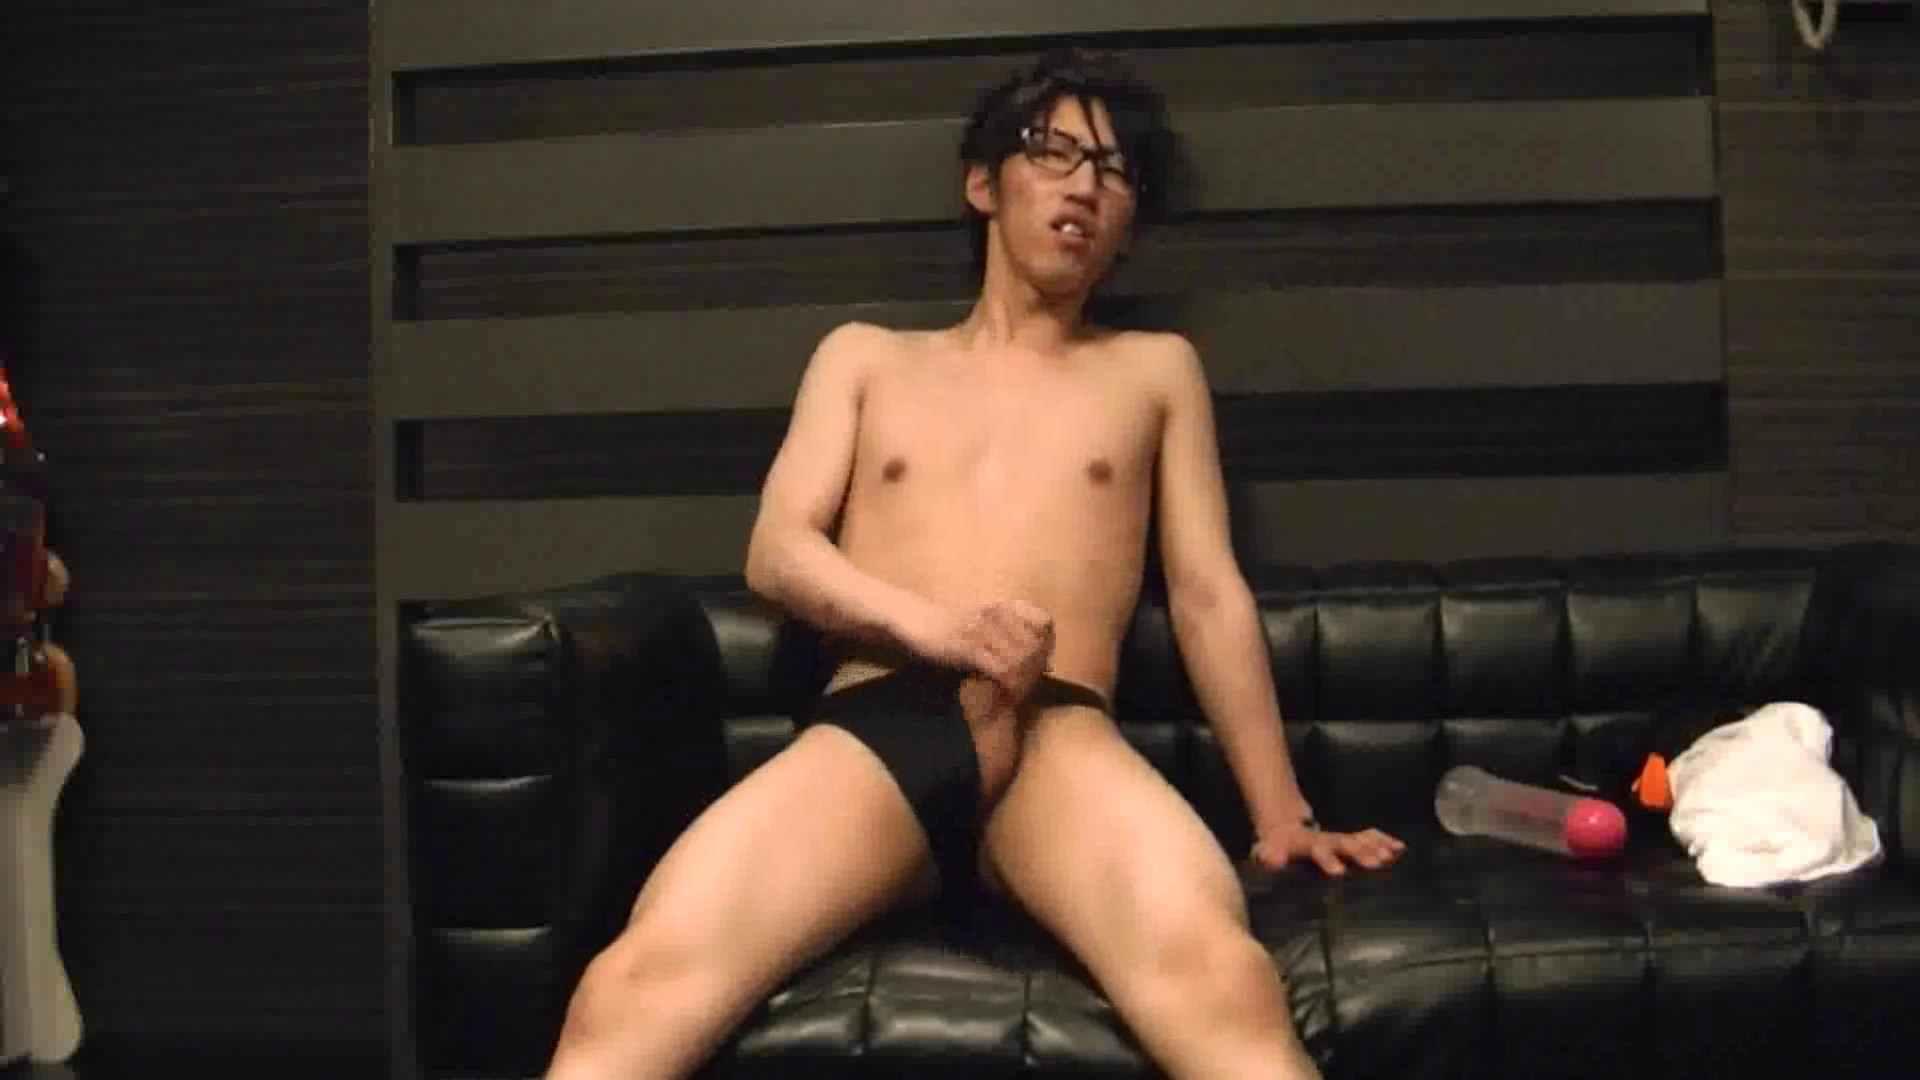 ONA見せカーニバル!! Vol3 男 ゲイ無料無修正画像 89枚 78